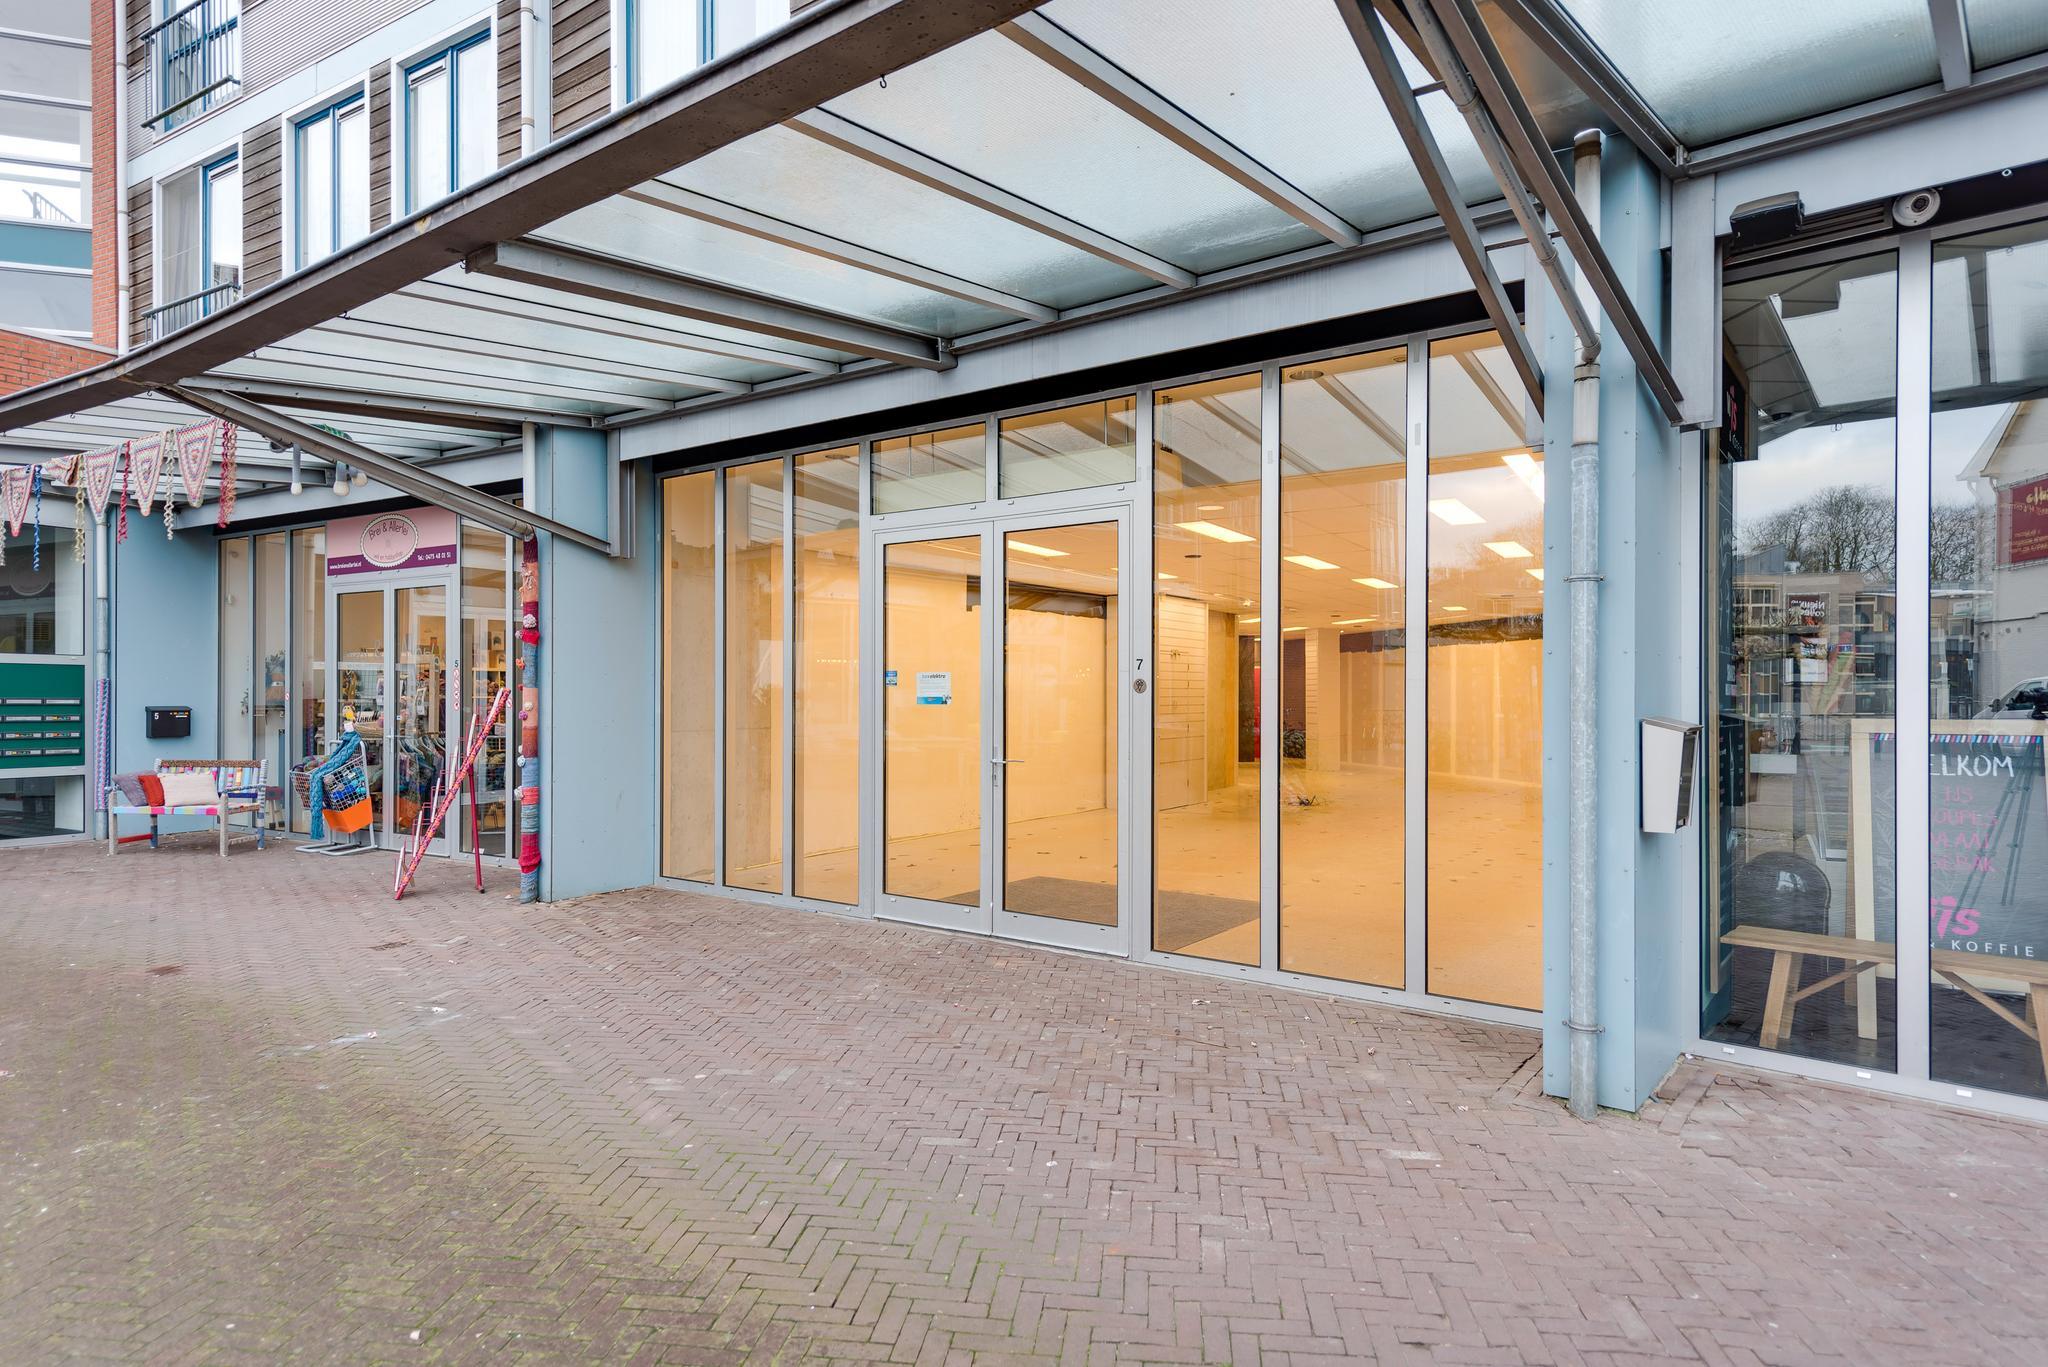 723607f209c Eduard Van Wegbergplein 7 in Heythuysen 6093 EX: Winkelruimte te huur. -  Hermans Bedrijfsmakelaars B.V.